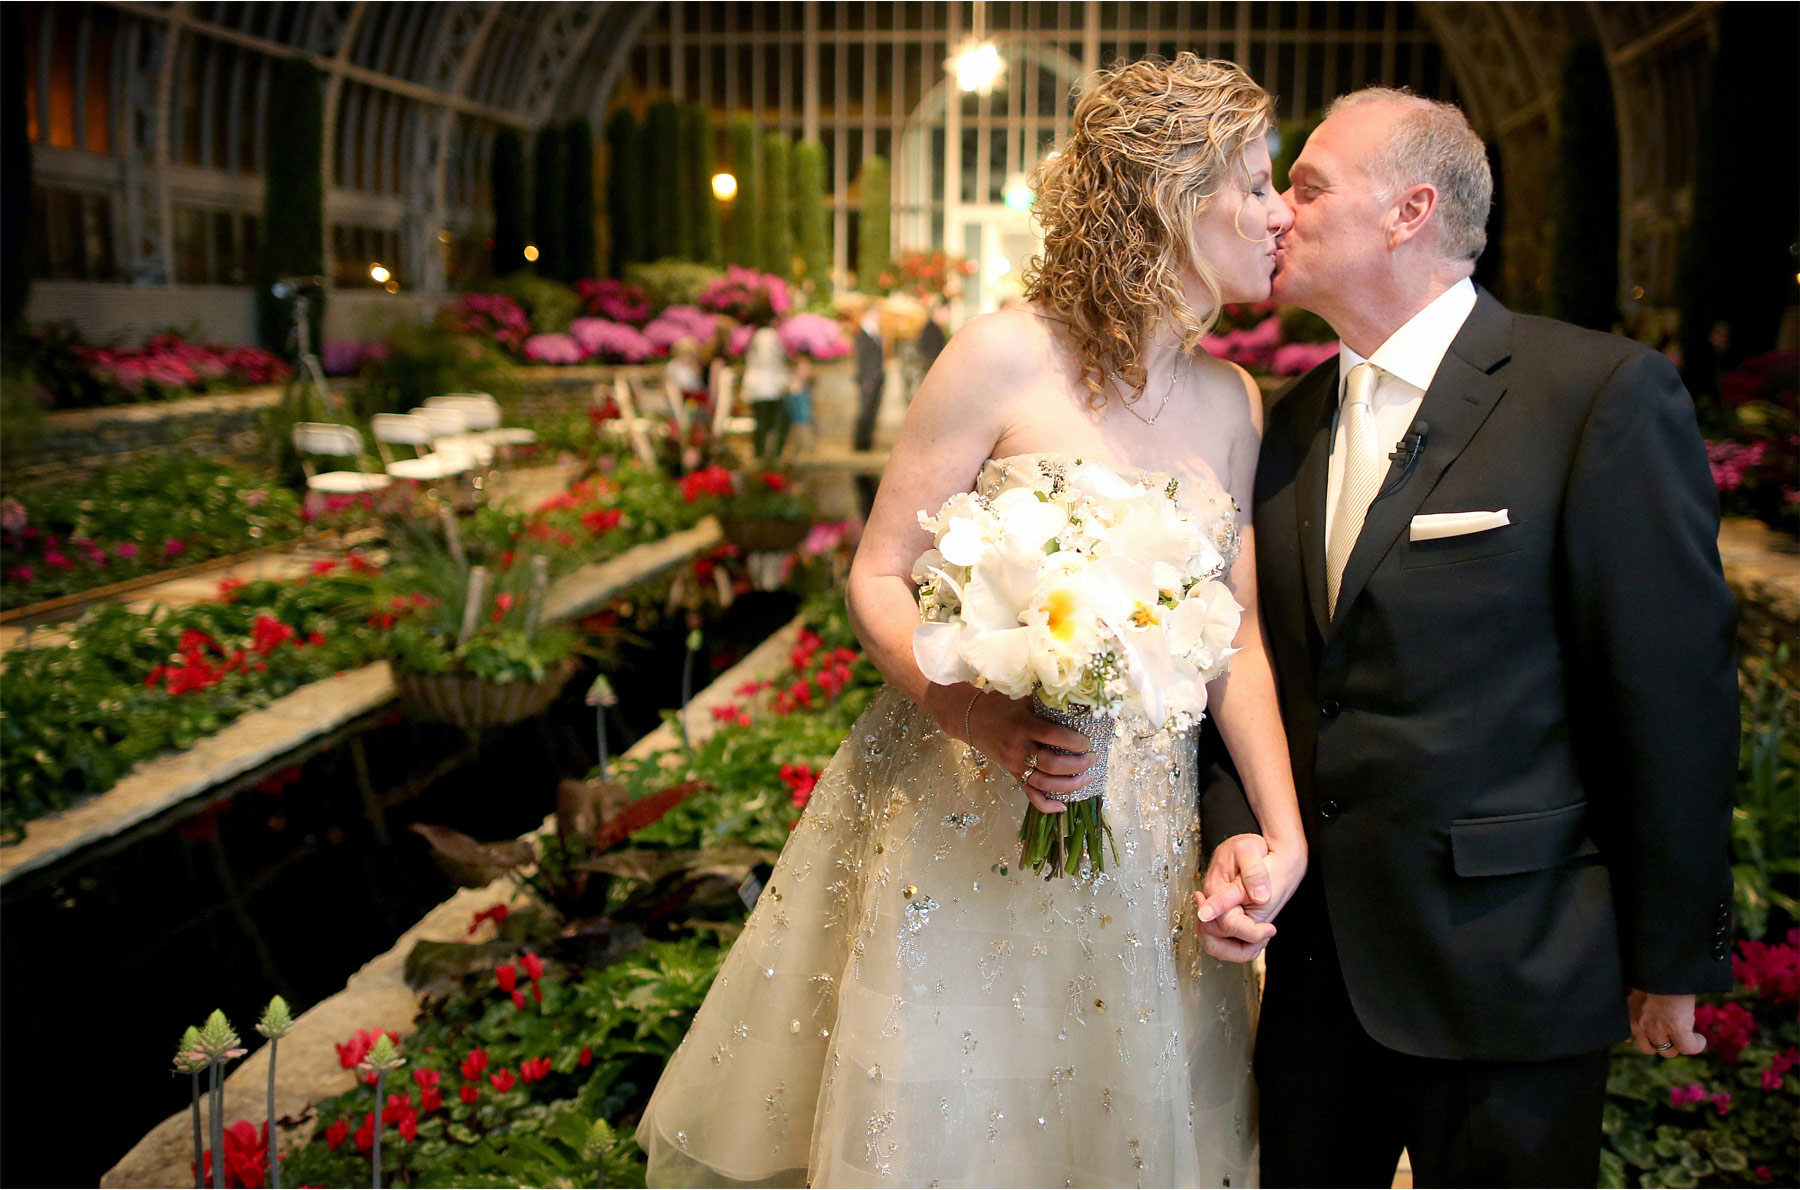 19-Saint-Paul-Minnesota-Wedding-Photographer-by-Andrew-Vick-Photography-Winter-Como-Park-Conservatory-Sunken-Garden-Bride-Groom-Kiss-Flowers-Night-Dannette-and-Darren.jpg